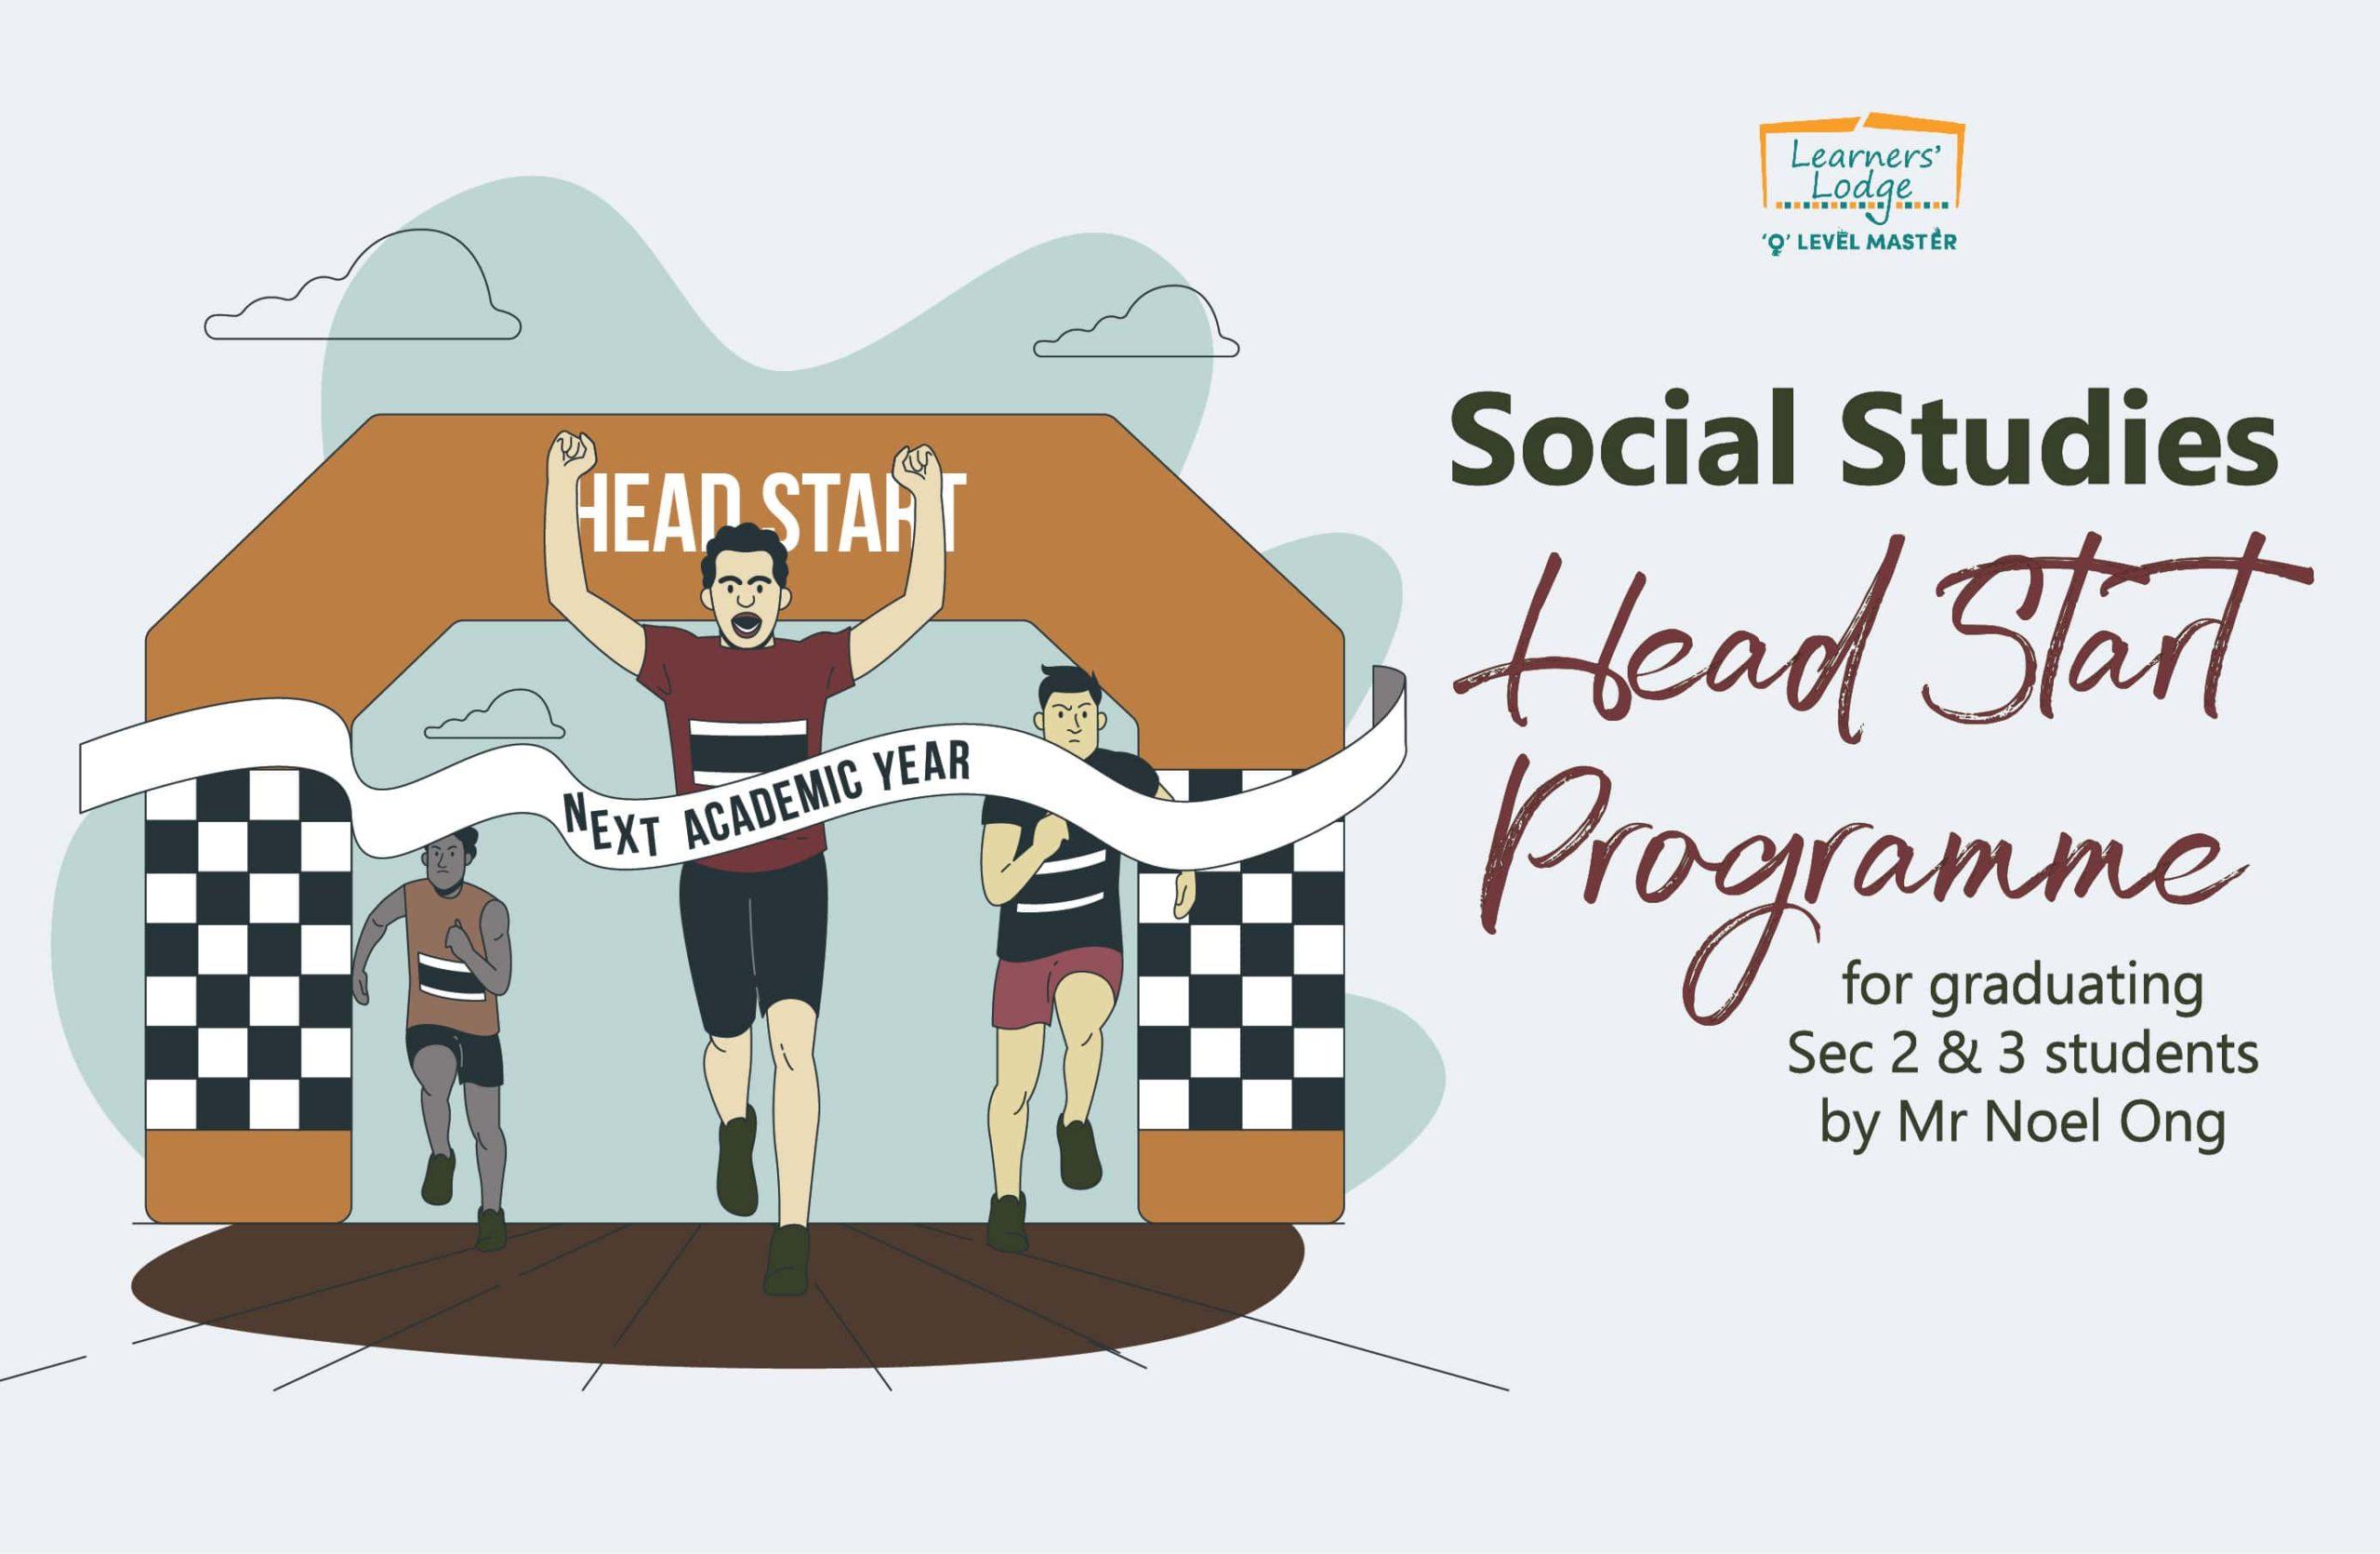 Social Studies Head Start Programme